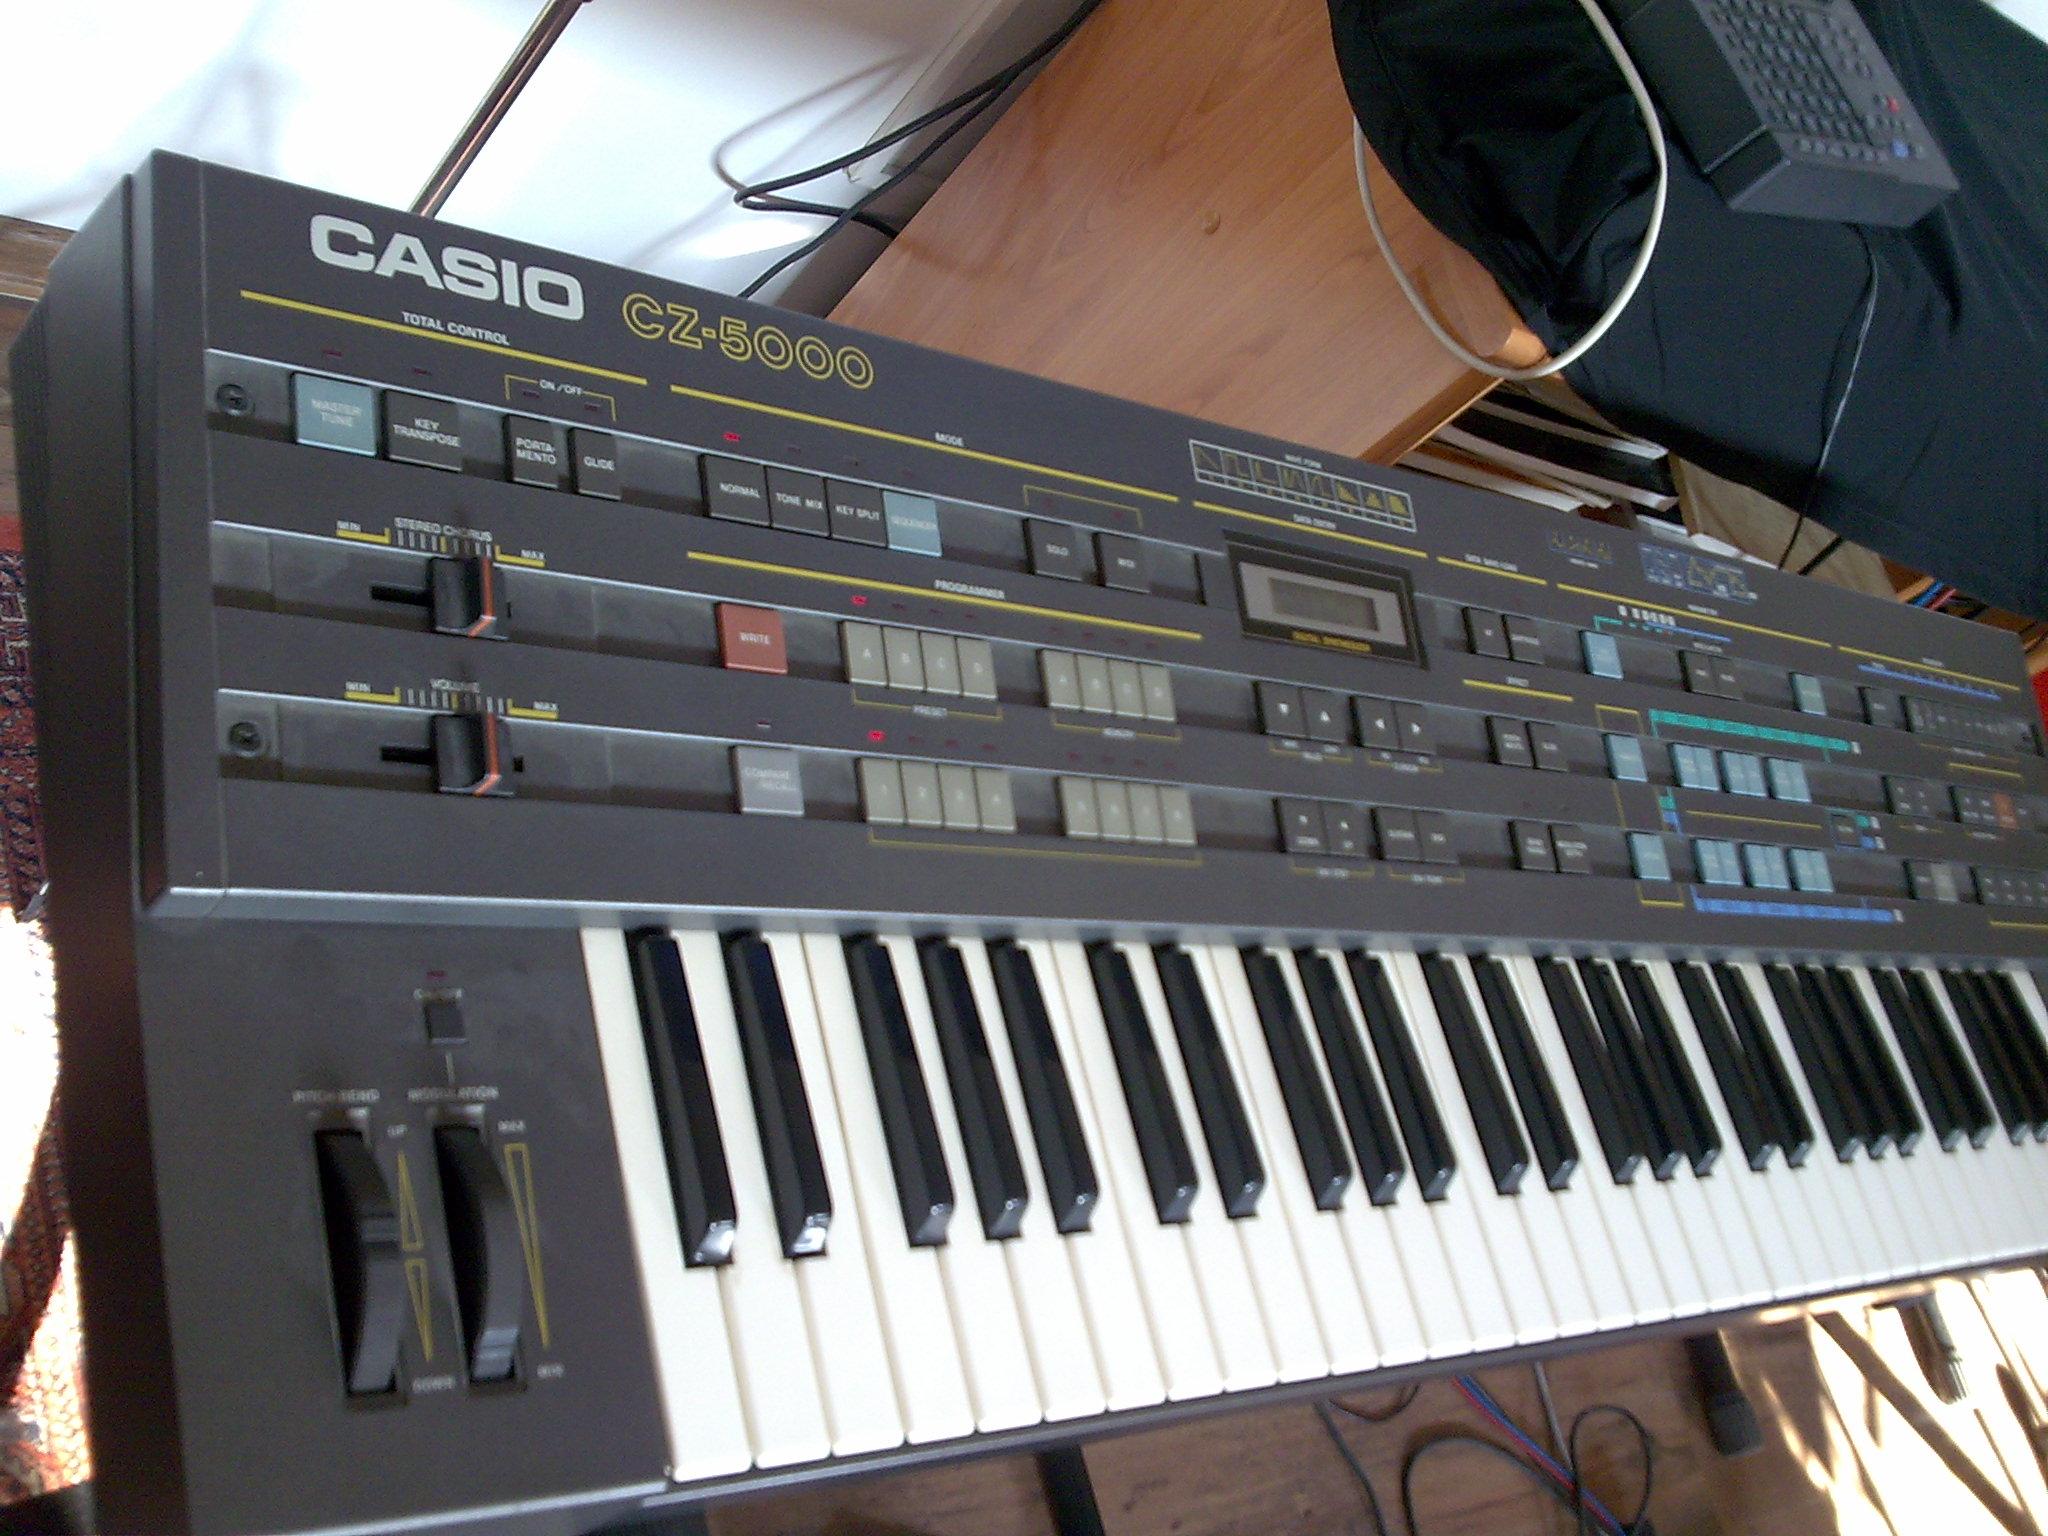 casio cz 5000 image 469379 audiofanzine rh en audiofanzine com Casio CZ 5000 Synthesizer